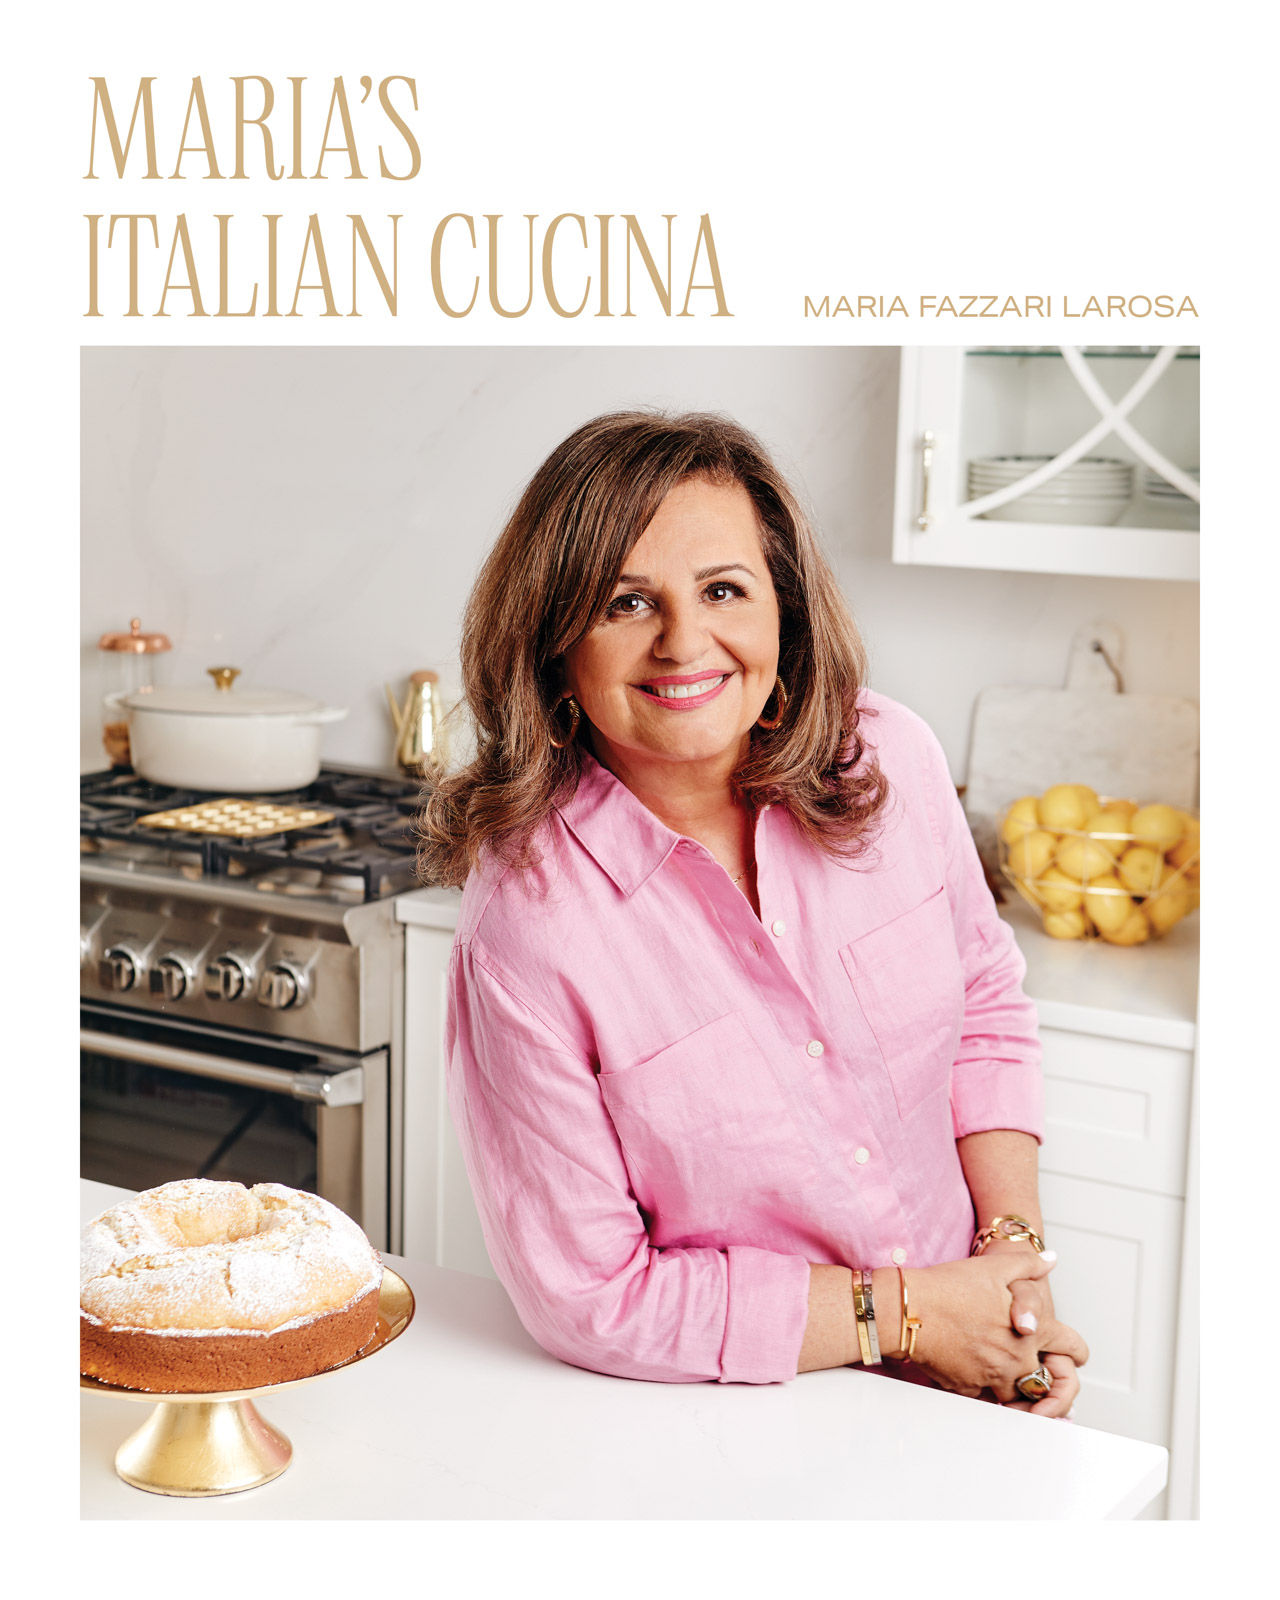 Maria's Italian Cucina